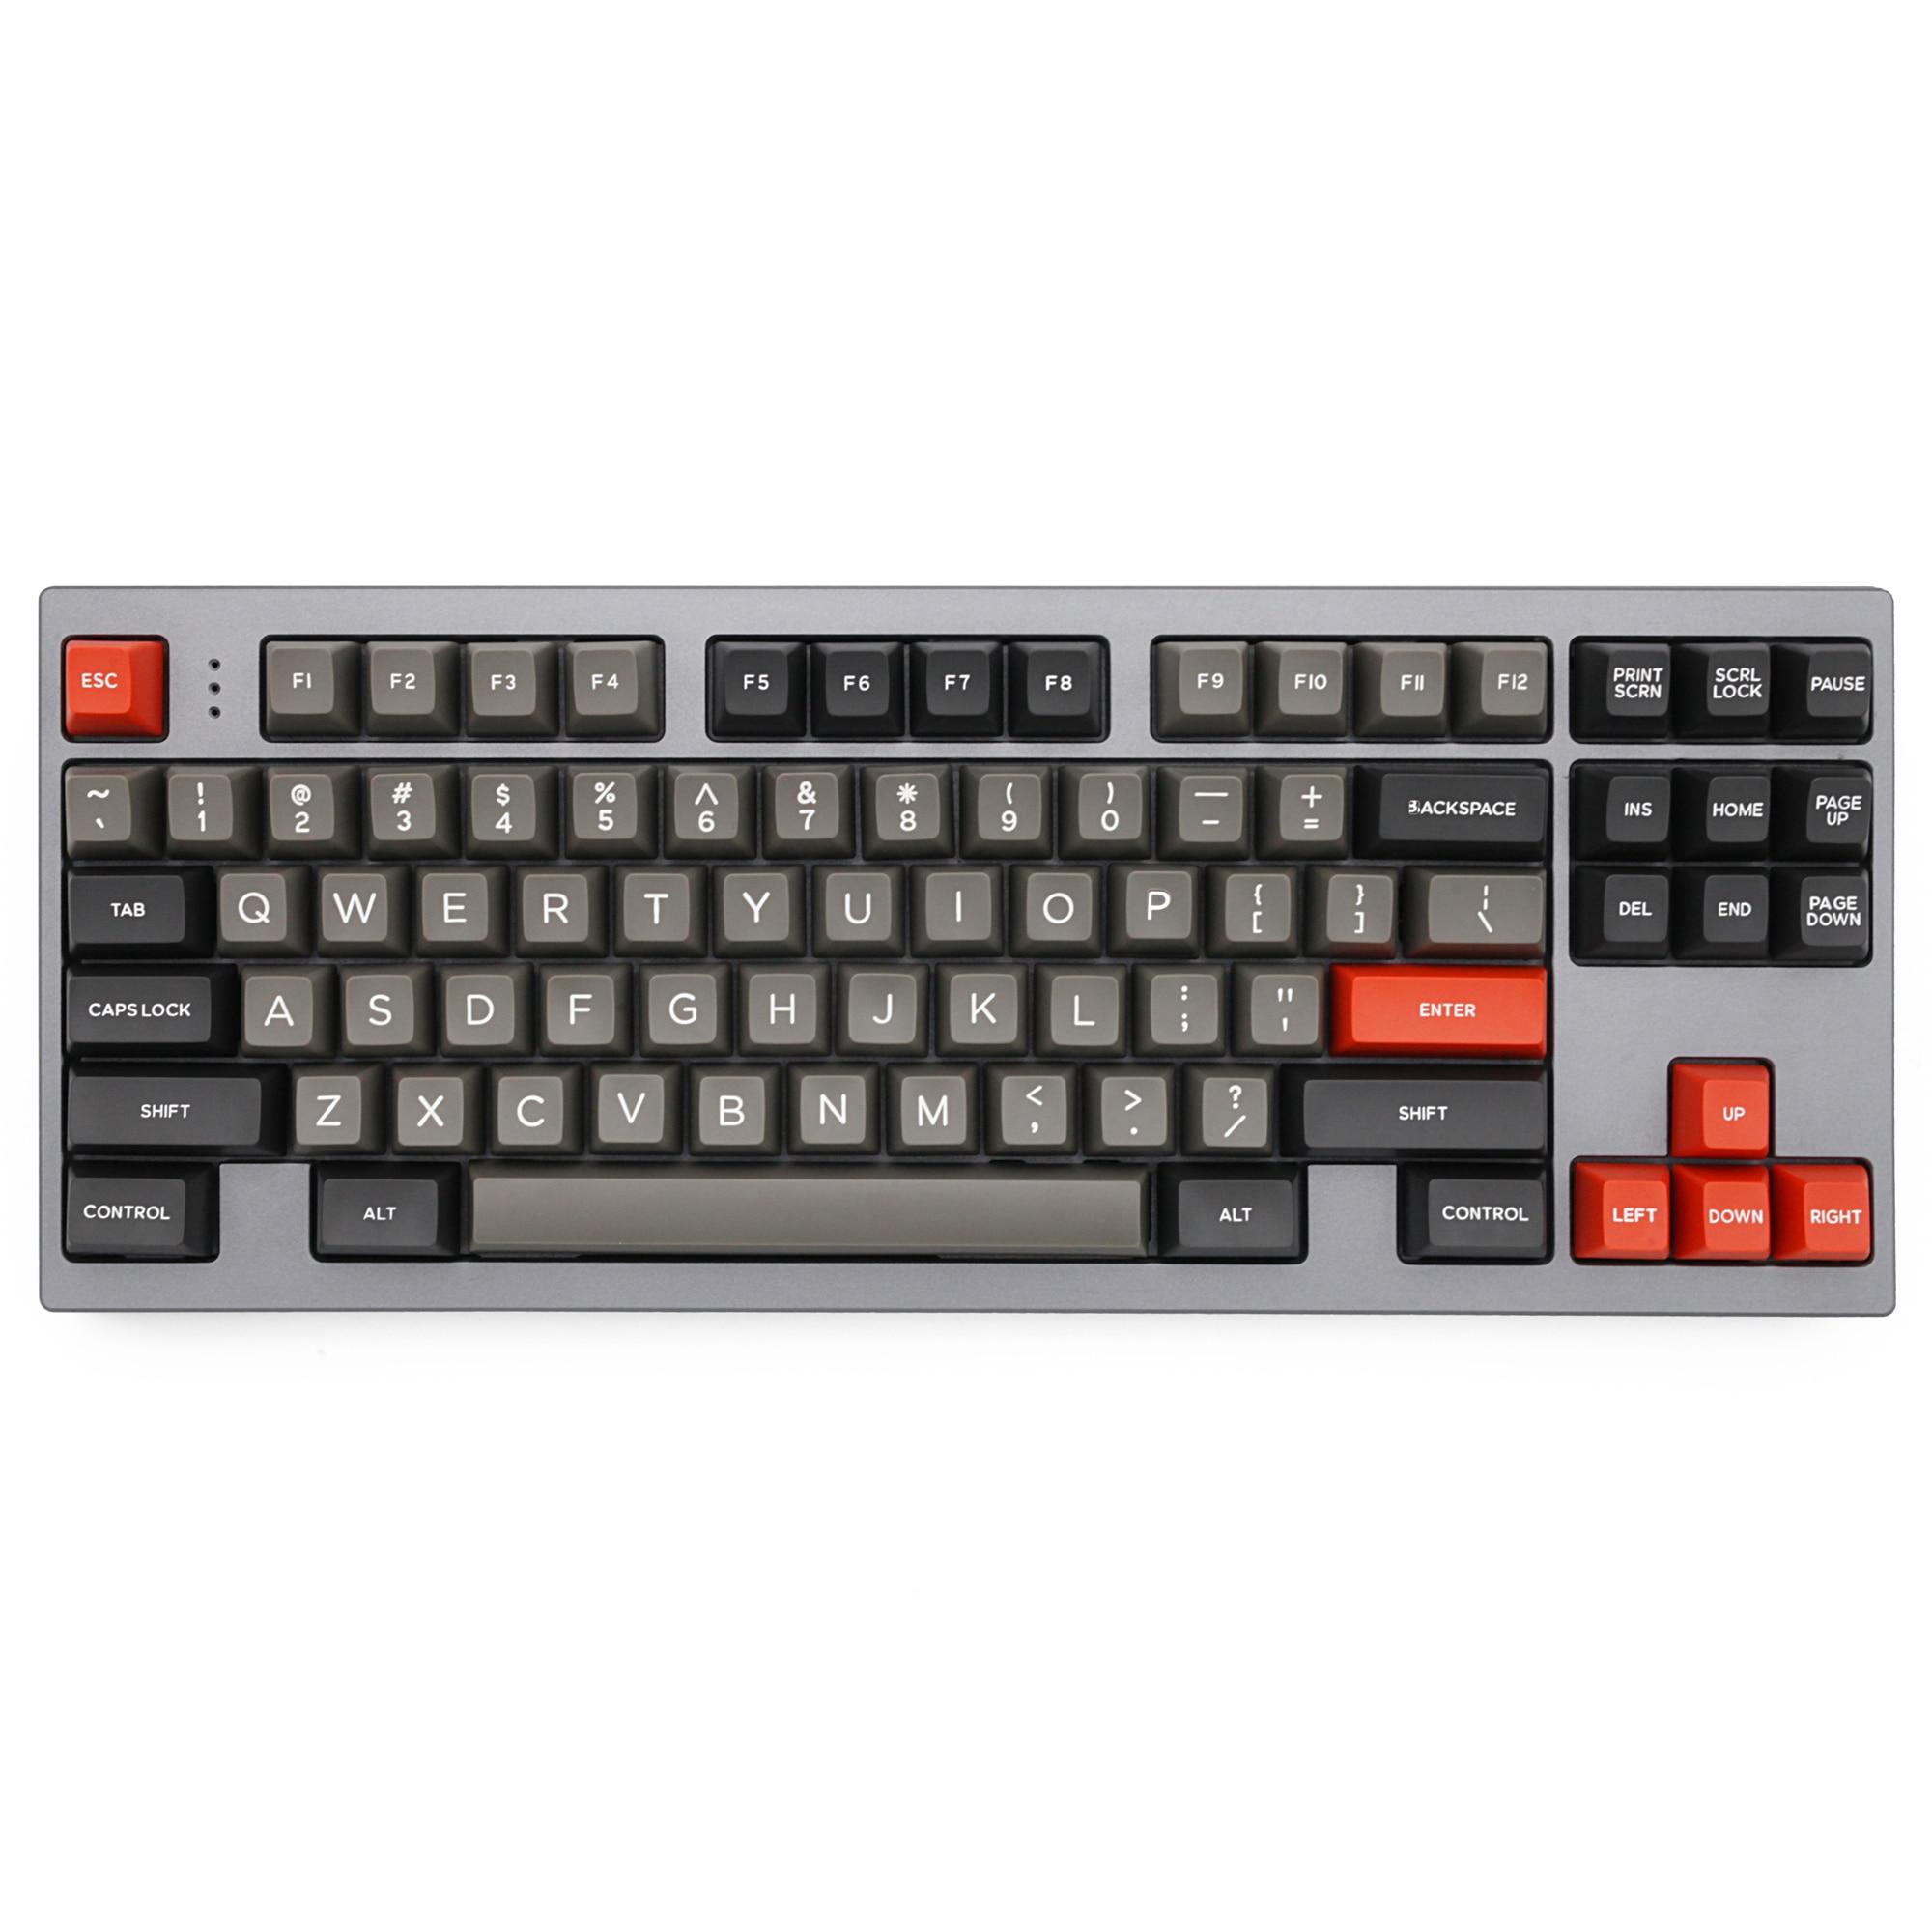 Domikey SA abs doubleshot keycap классический профиль Dolch SA для mx stem keyboard poker 87 104 gh60 xd64 xd68 xd84 xd96 xd75 xd87